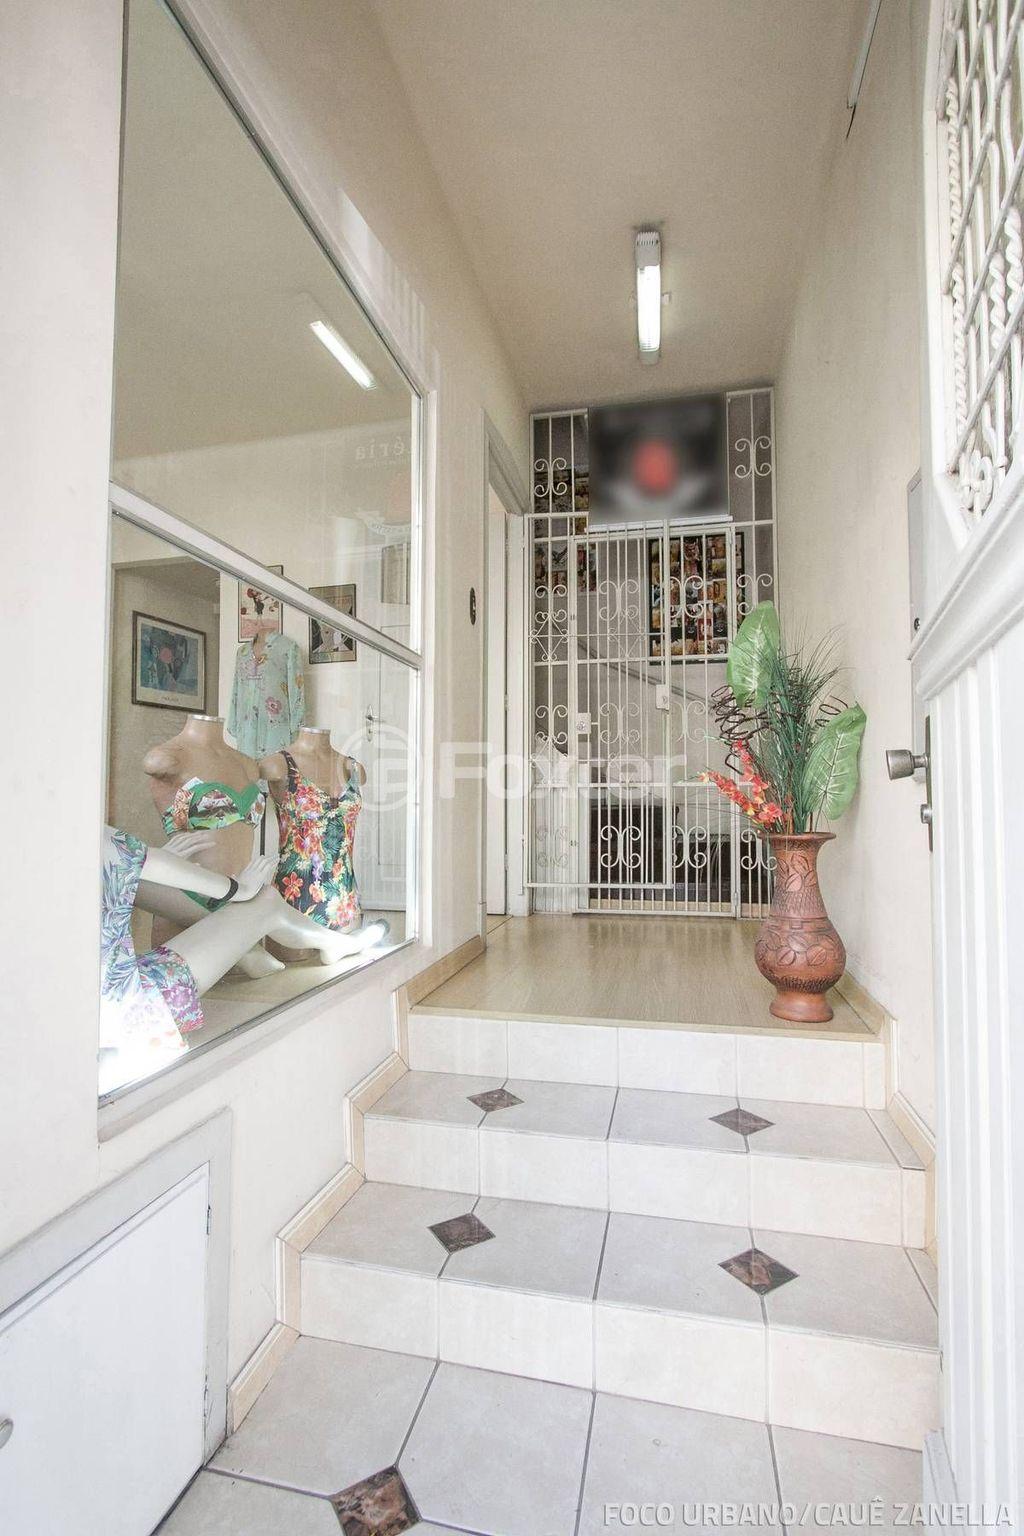 Casa 2 Dorm, Santana, Porto Alegre (7542) - Foto 2